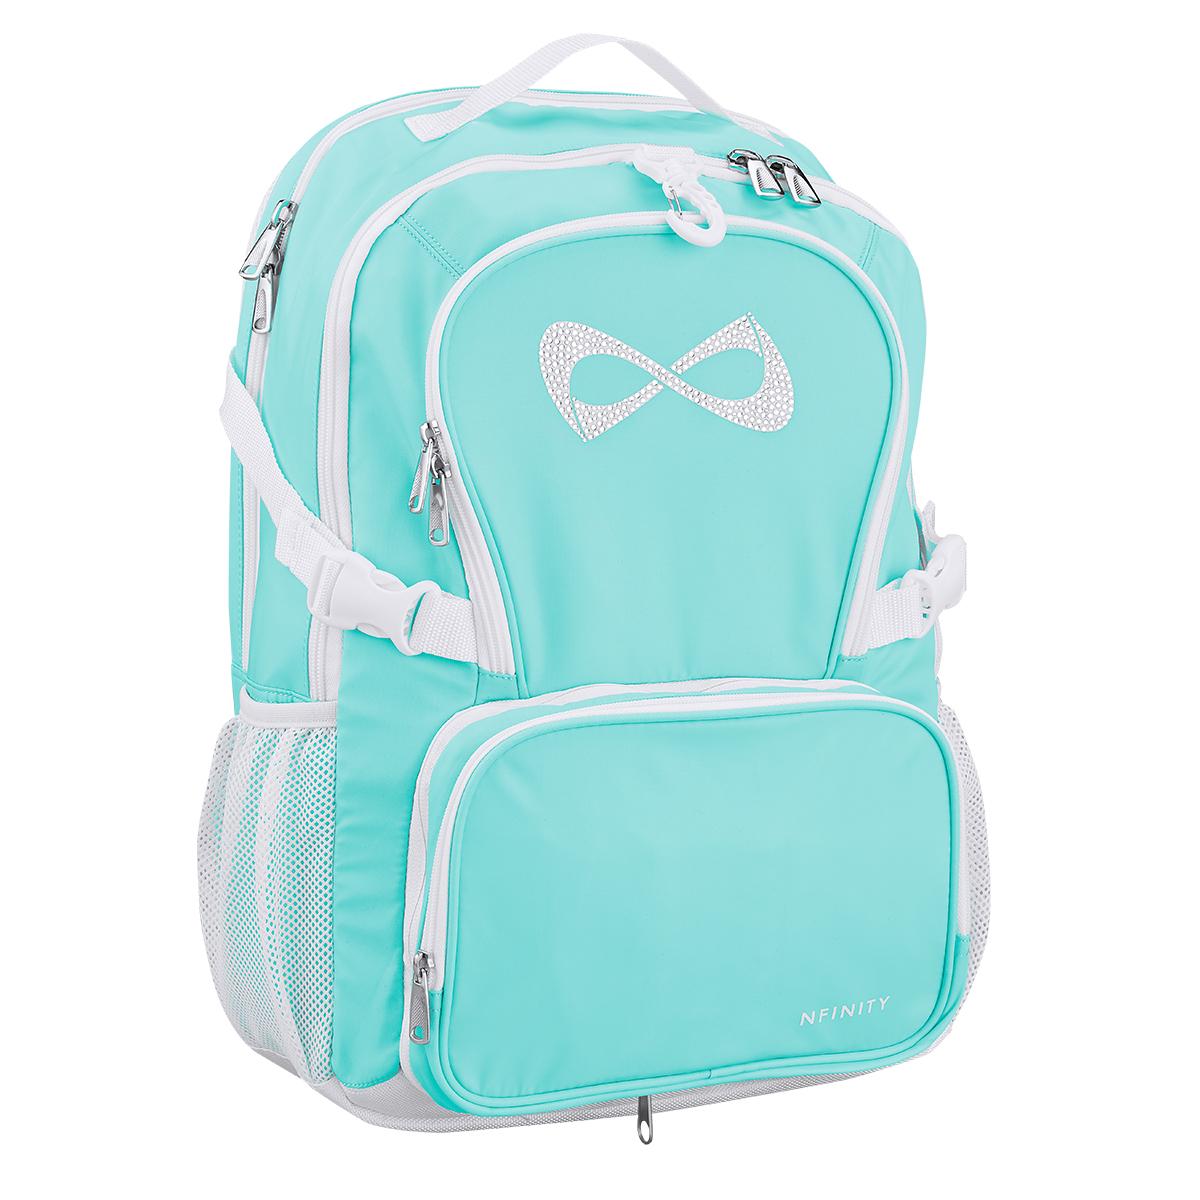 6a0153ec1d1a Nfinity Princess Backpack | High-quality cheerleading uniforms ...